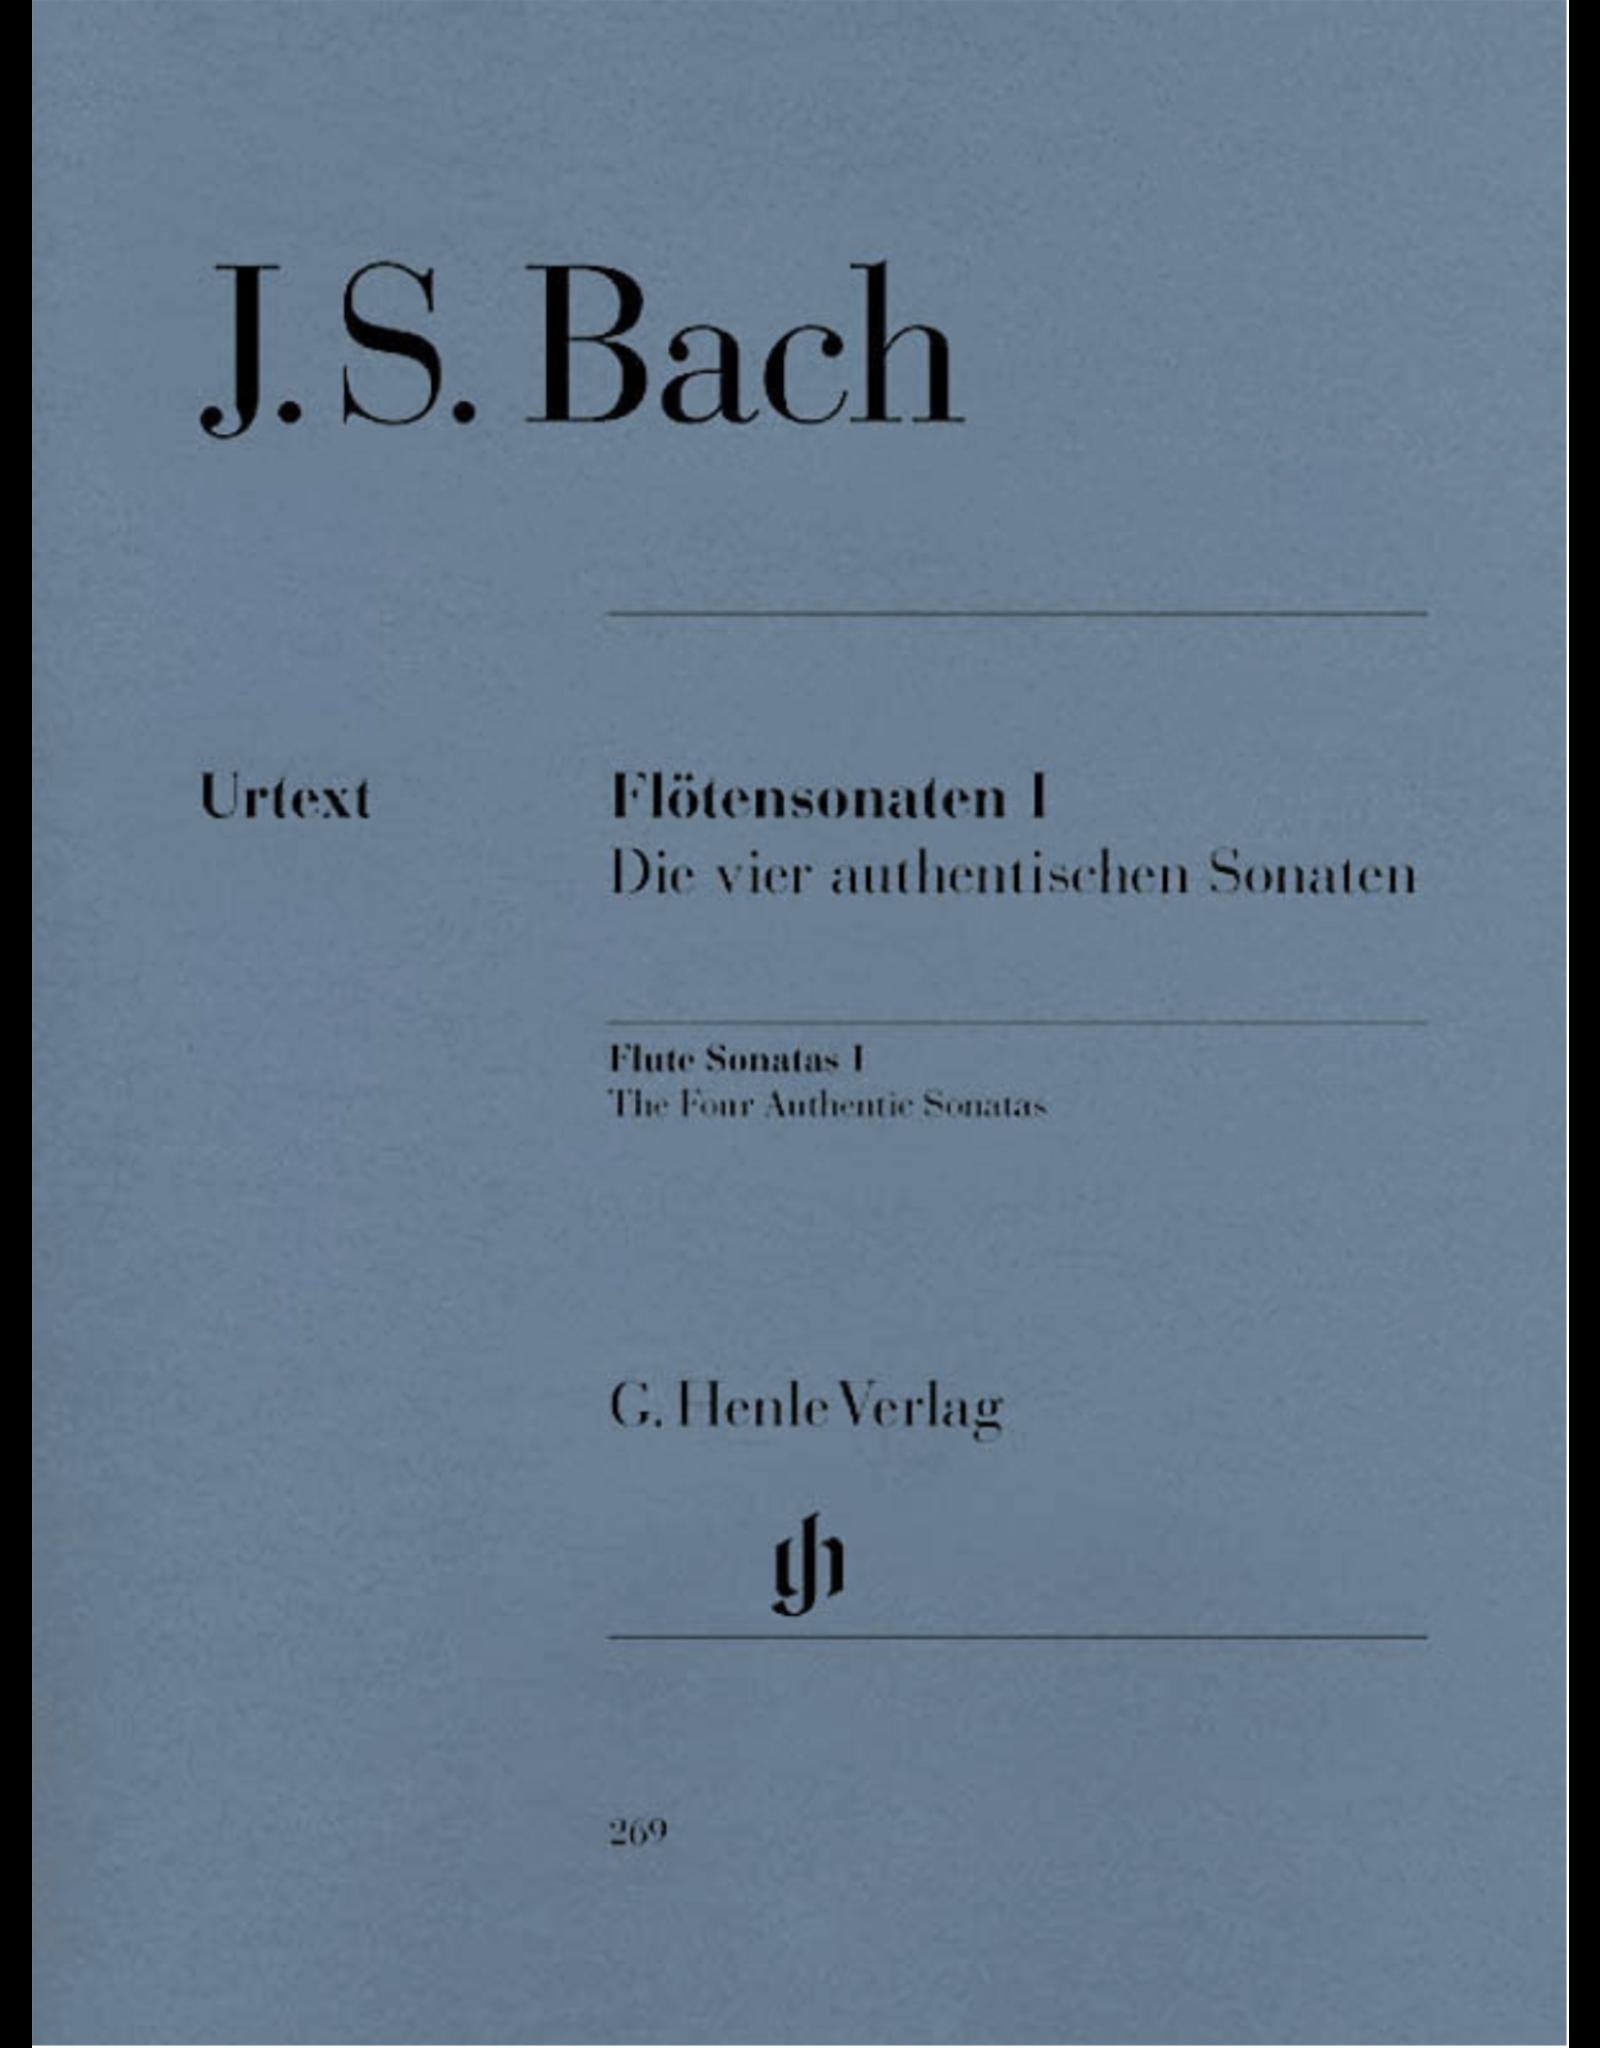 Hal Leonard Flute Sonatas - Volume 1 The Four Authentic Sonatas - with Violoncello Part